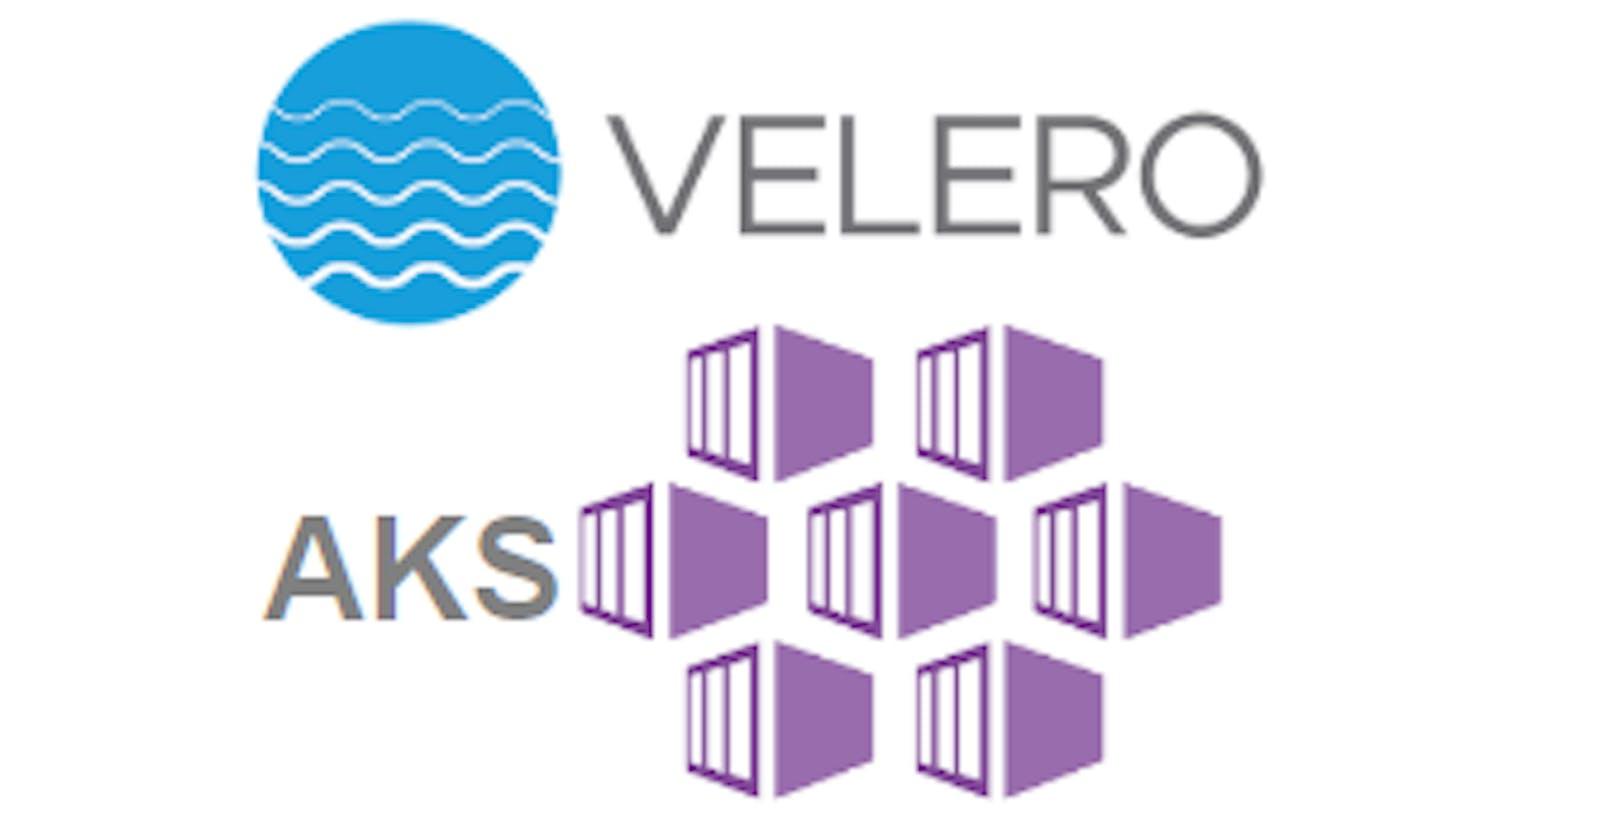 Deploy Azure AKS cluster and Backup it with Velero